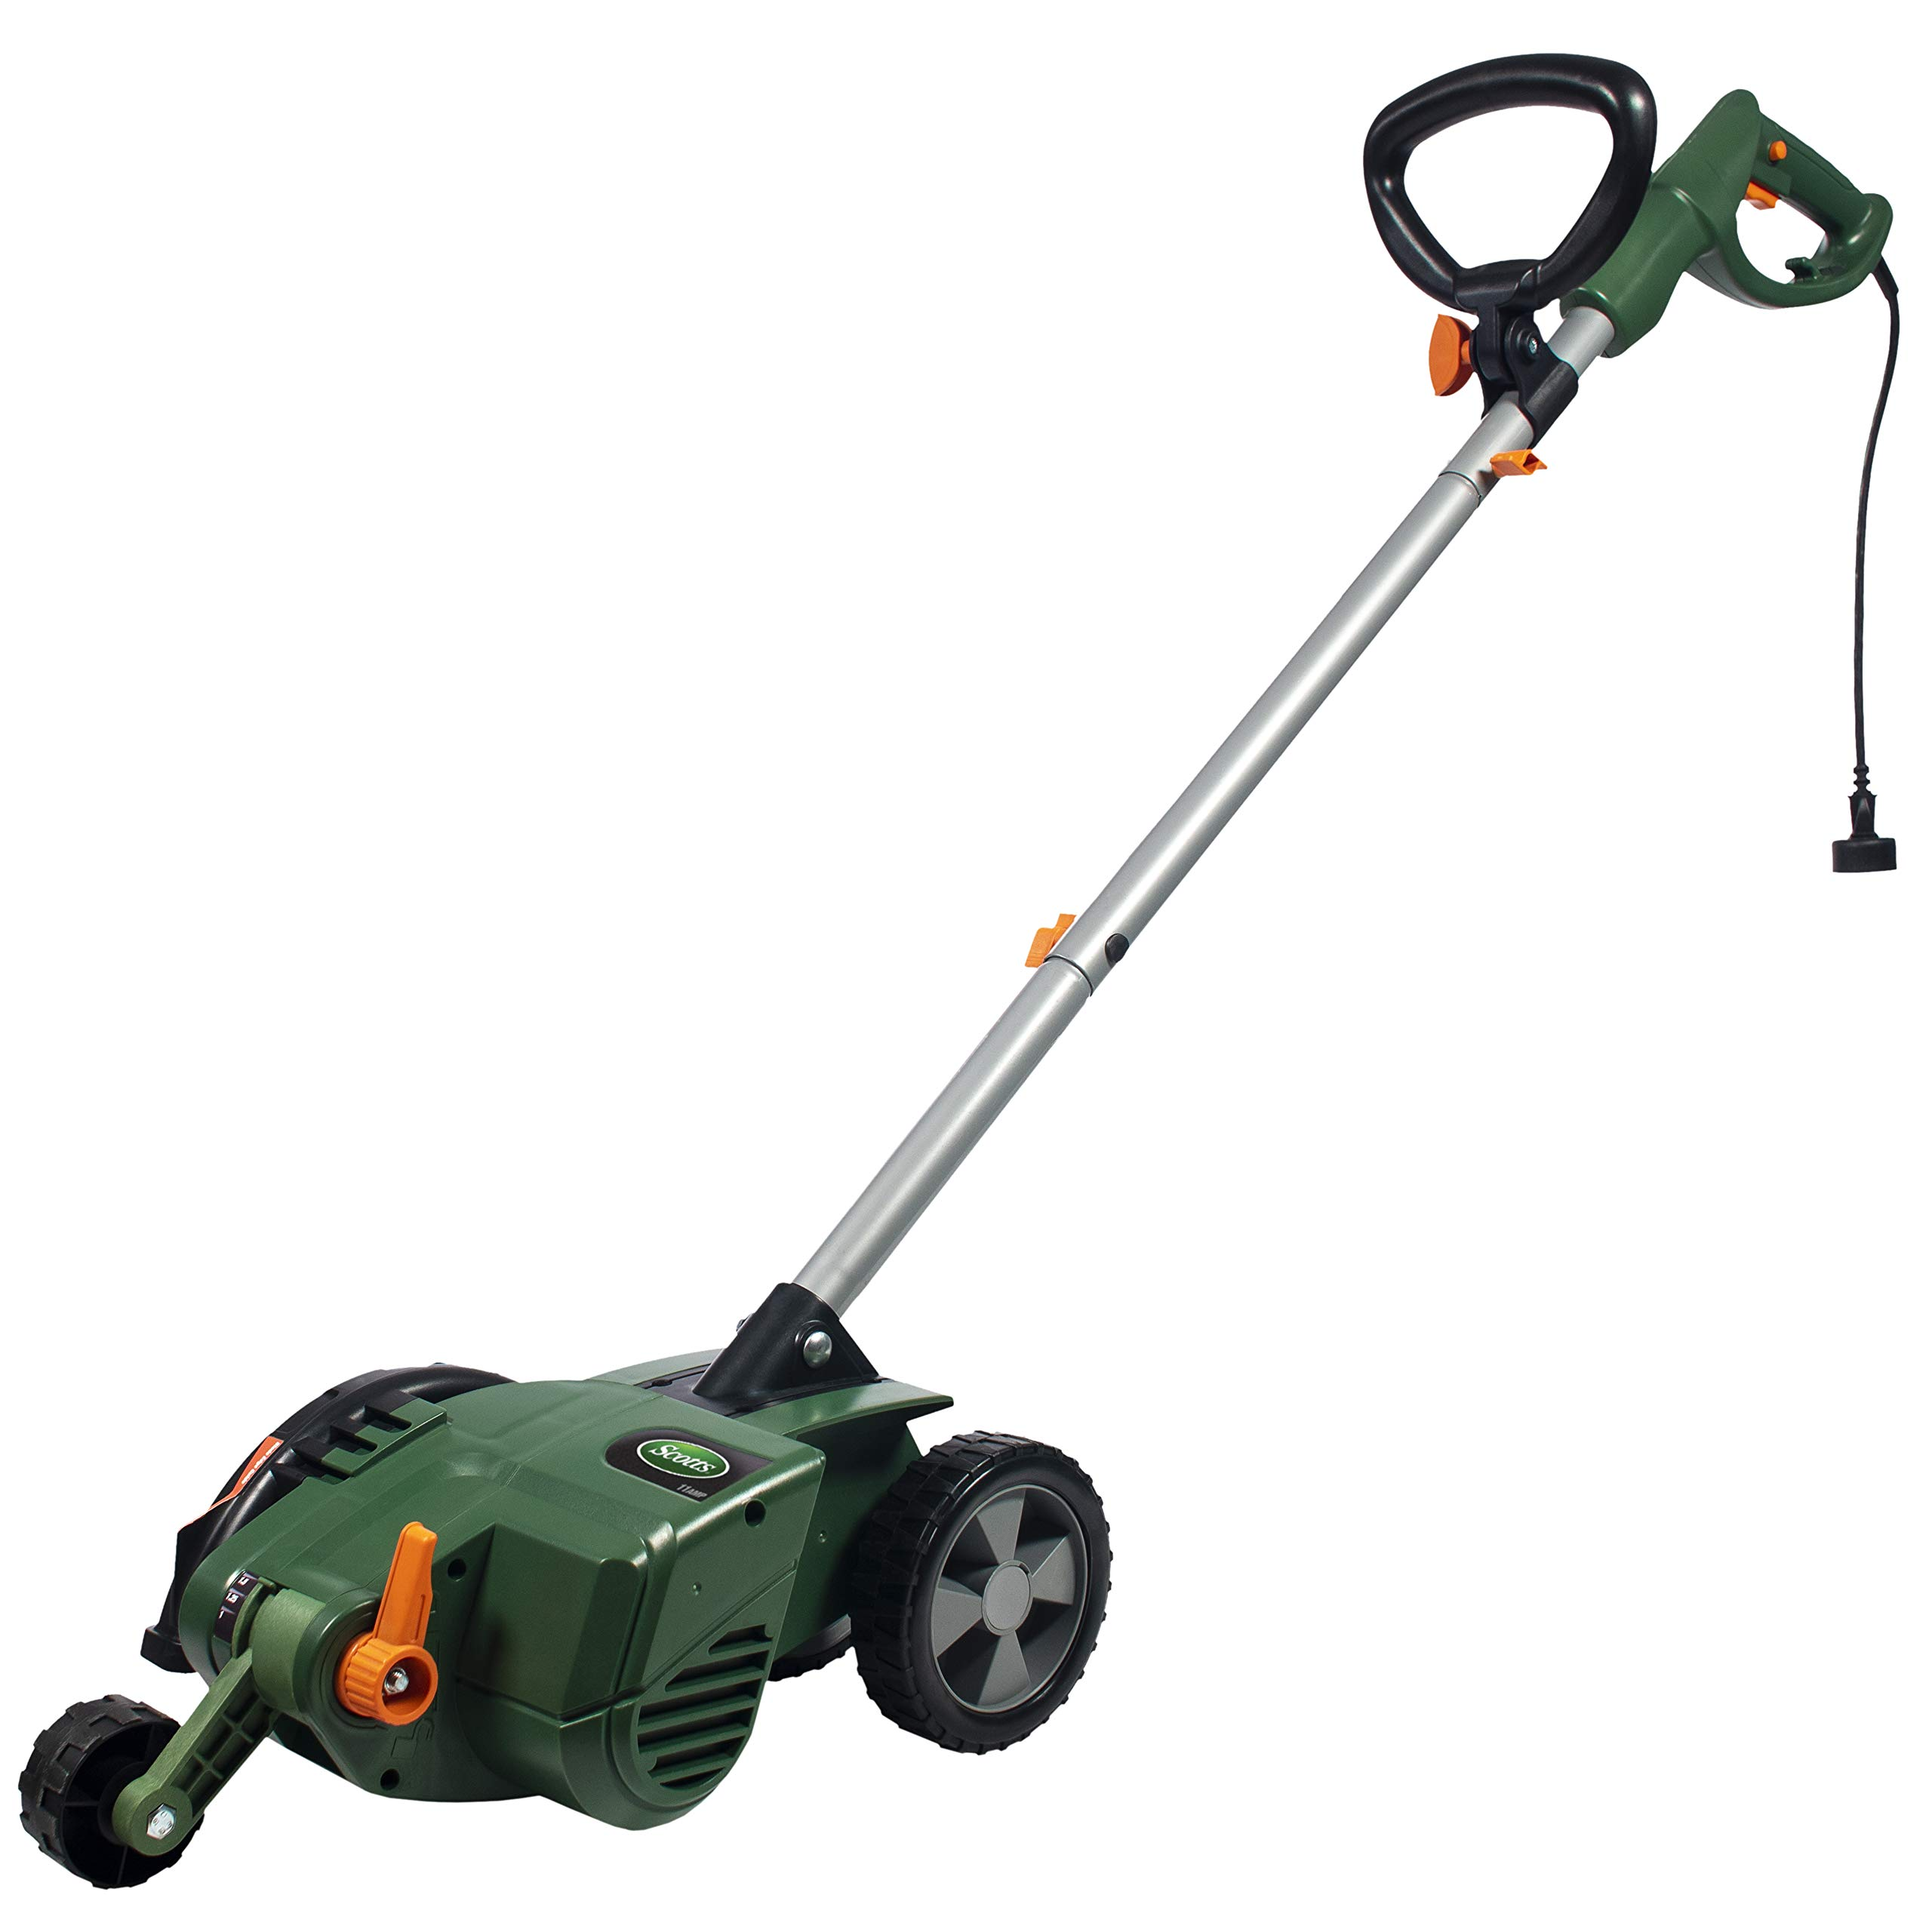 Scotts Outdoor Power Tools ED70012S